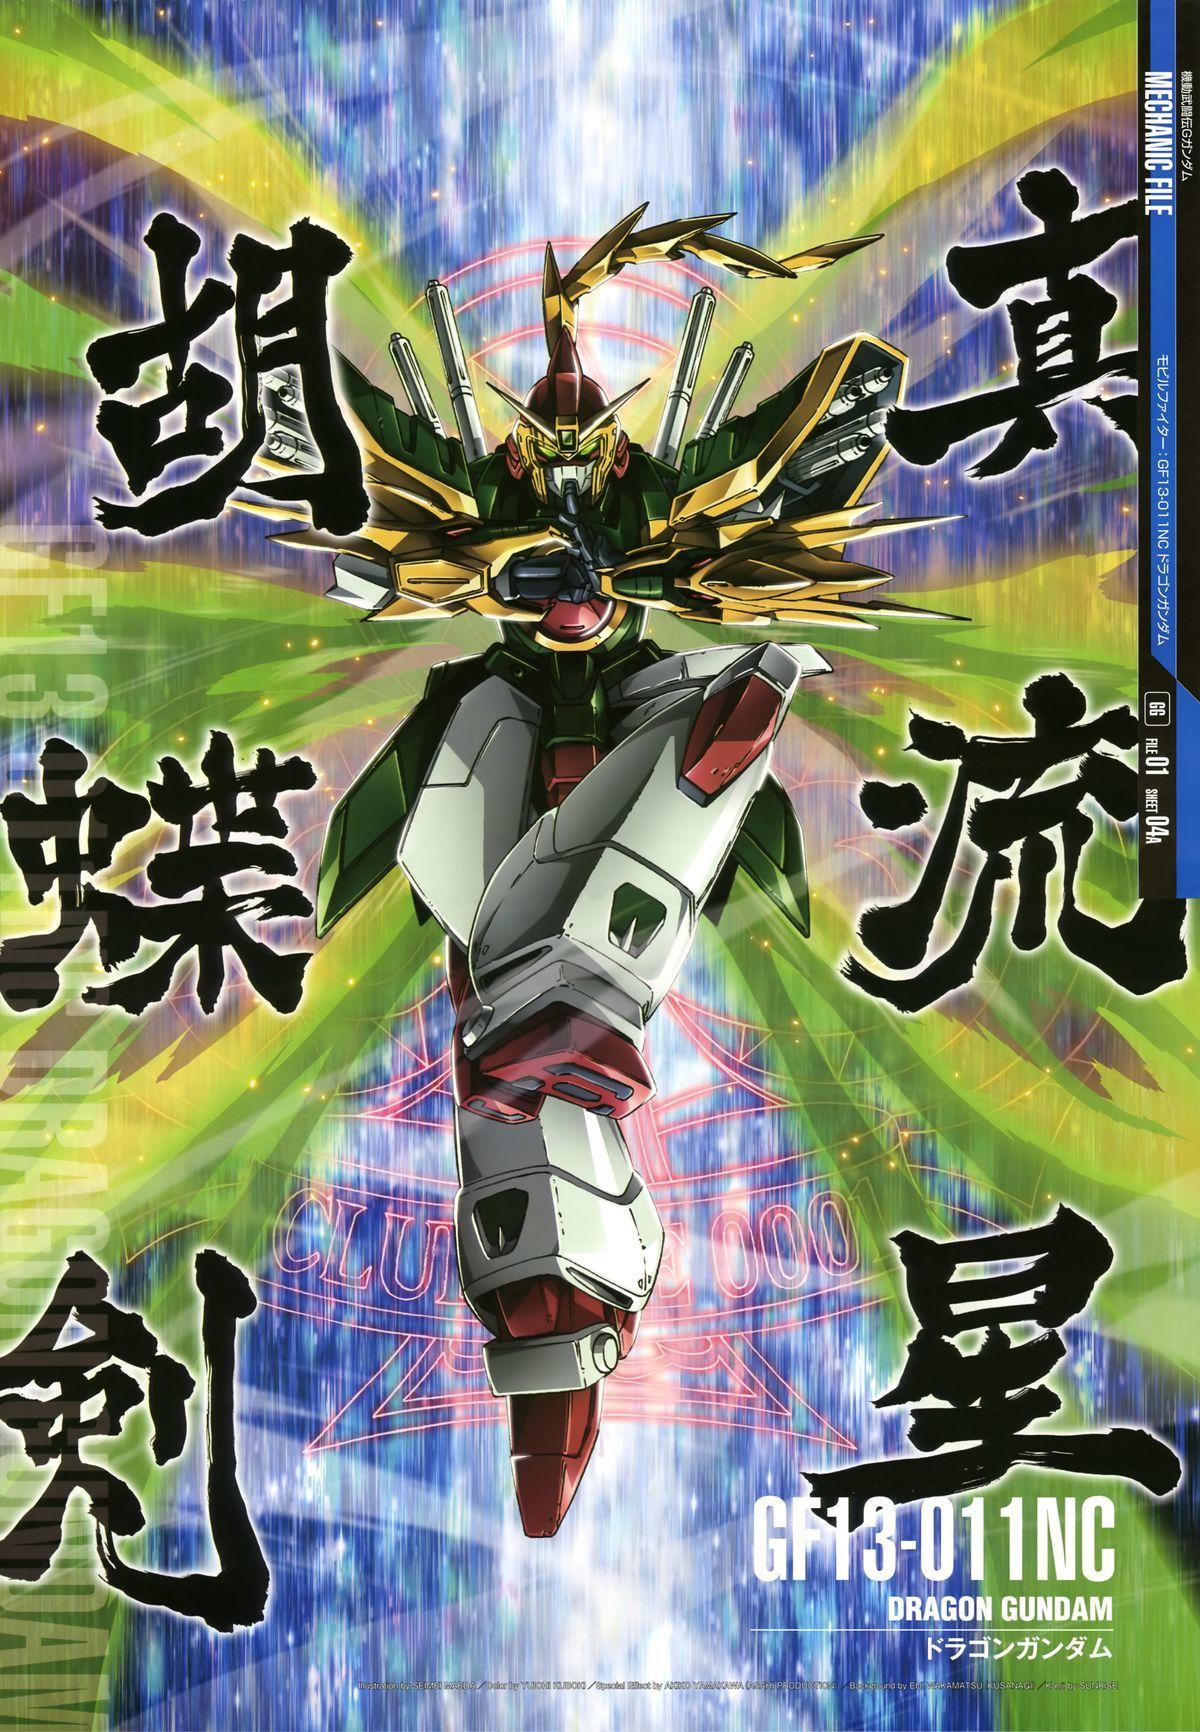 Mobile Fighter G Gundam Gf13 011nc Dragon Gundam Gundam Gundam Art Gundam Wallpapers